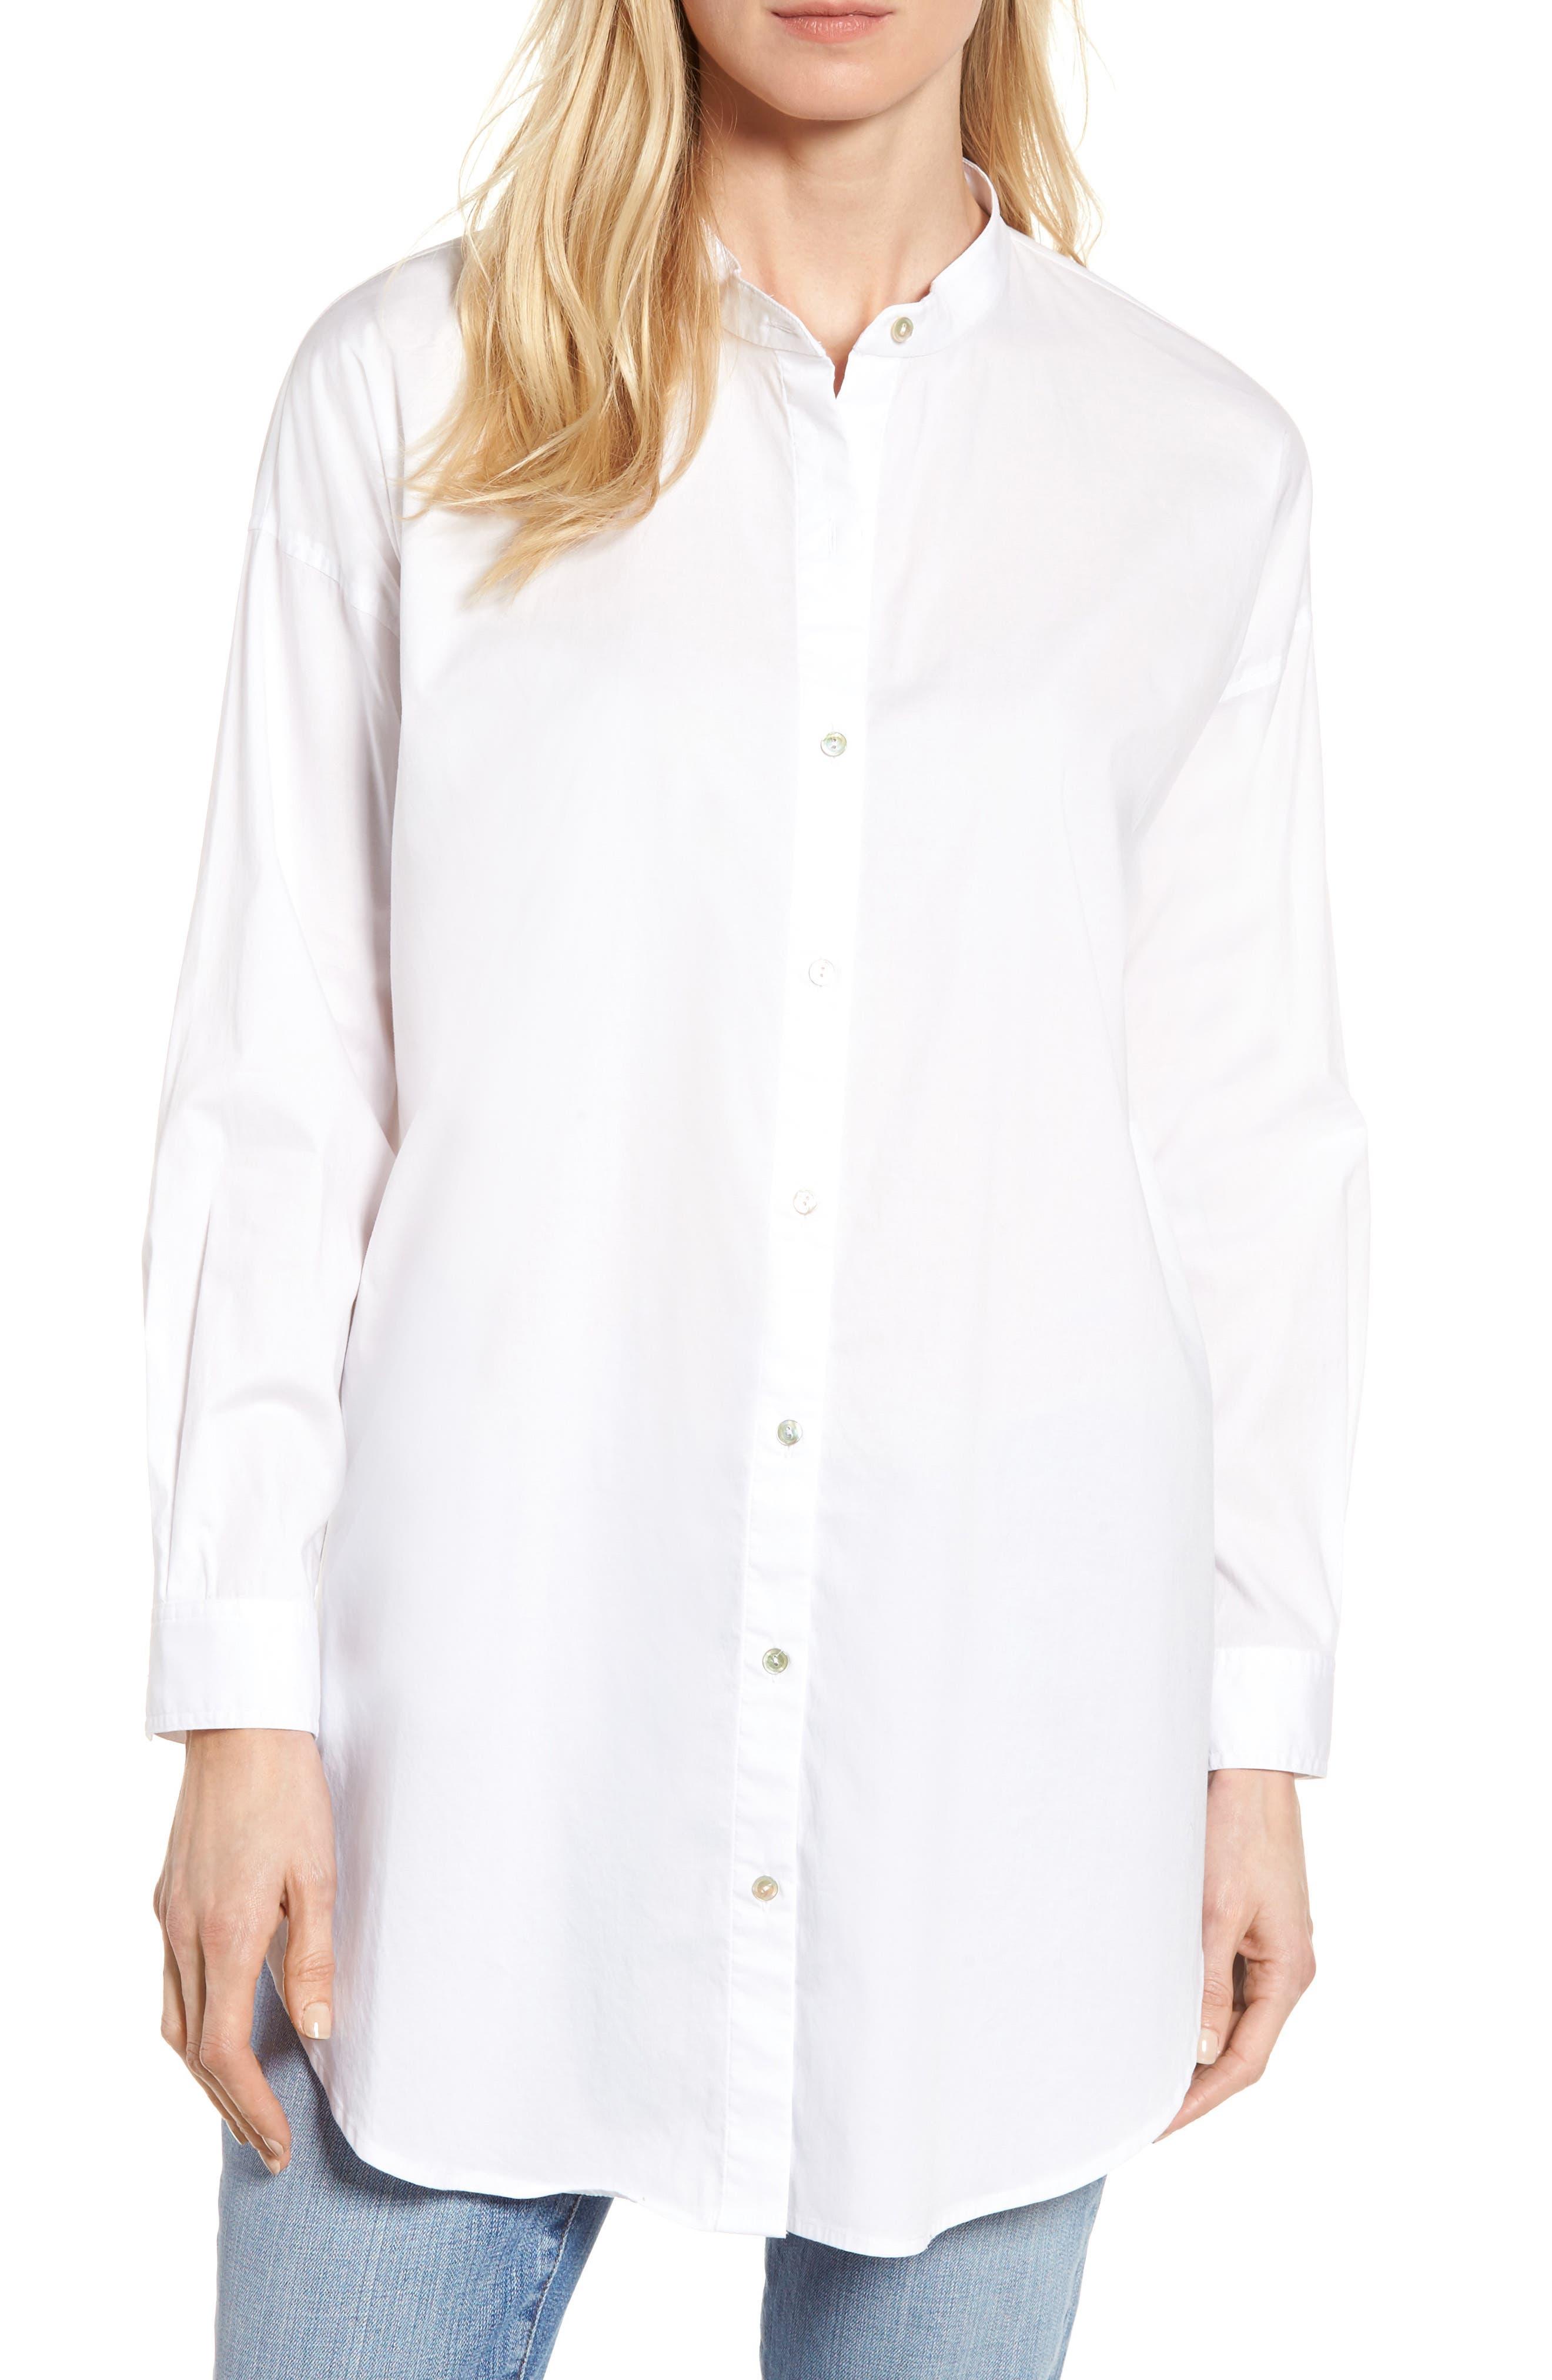 Eileen Fisher Stretch Organic Cotton Tunic Shirt (Regular & Petite)